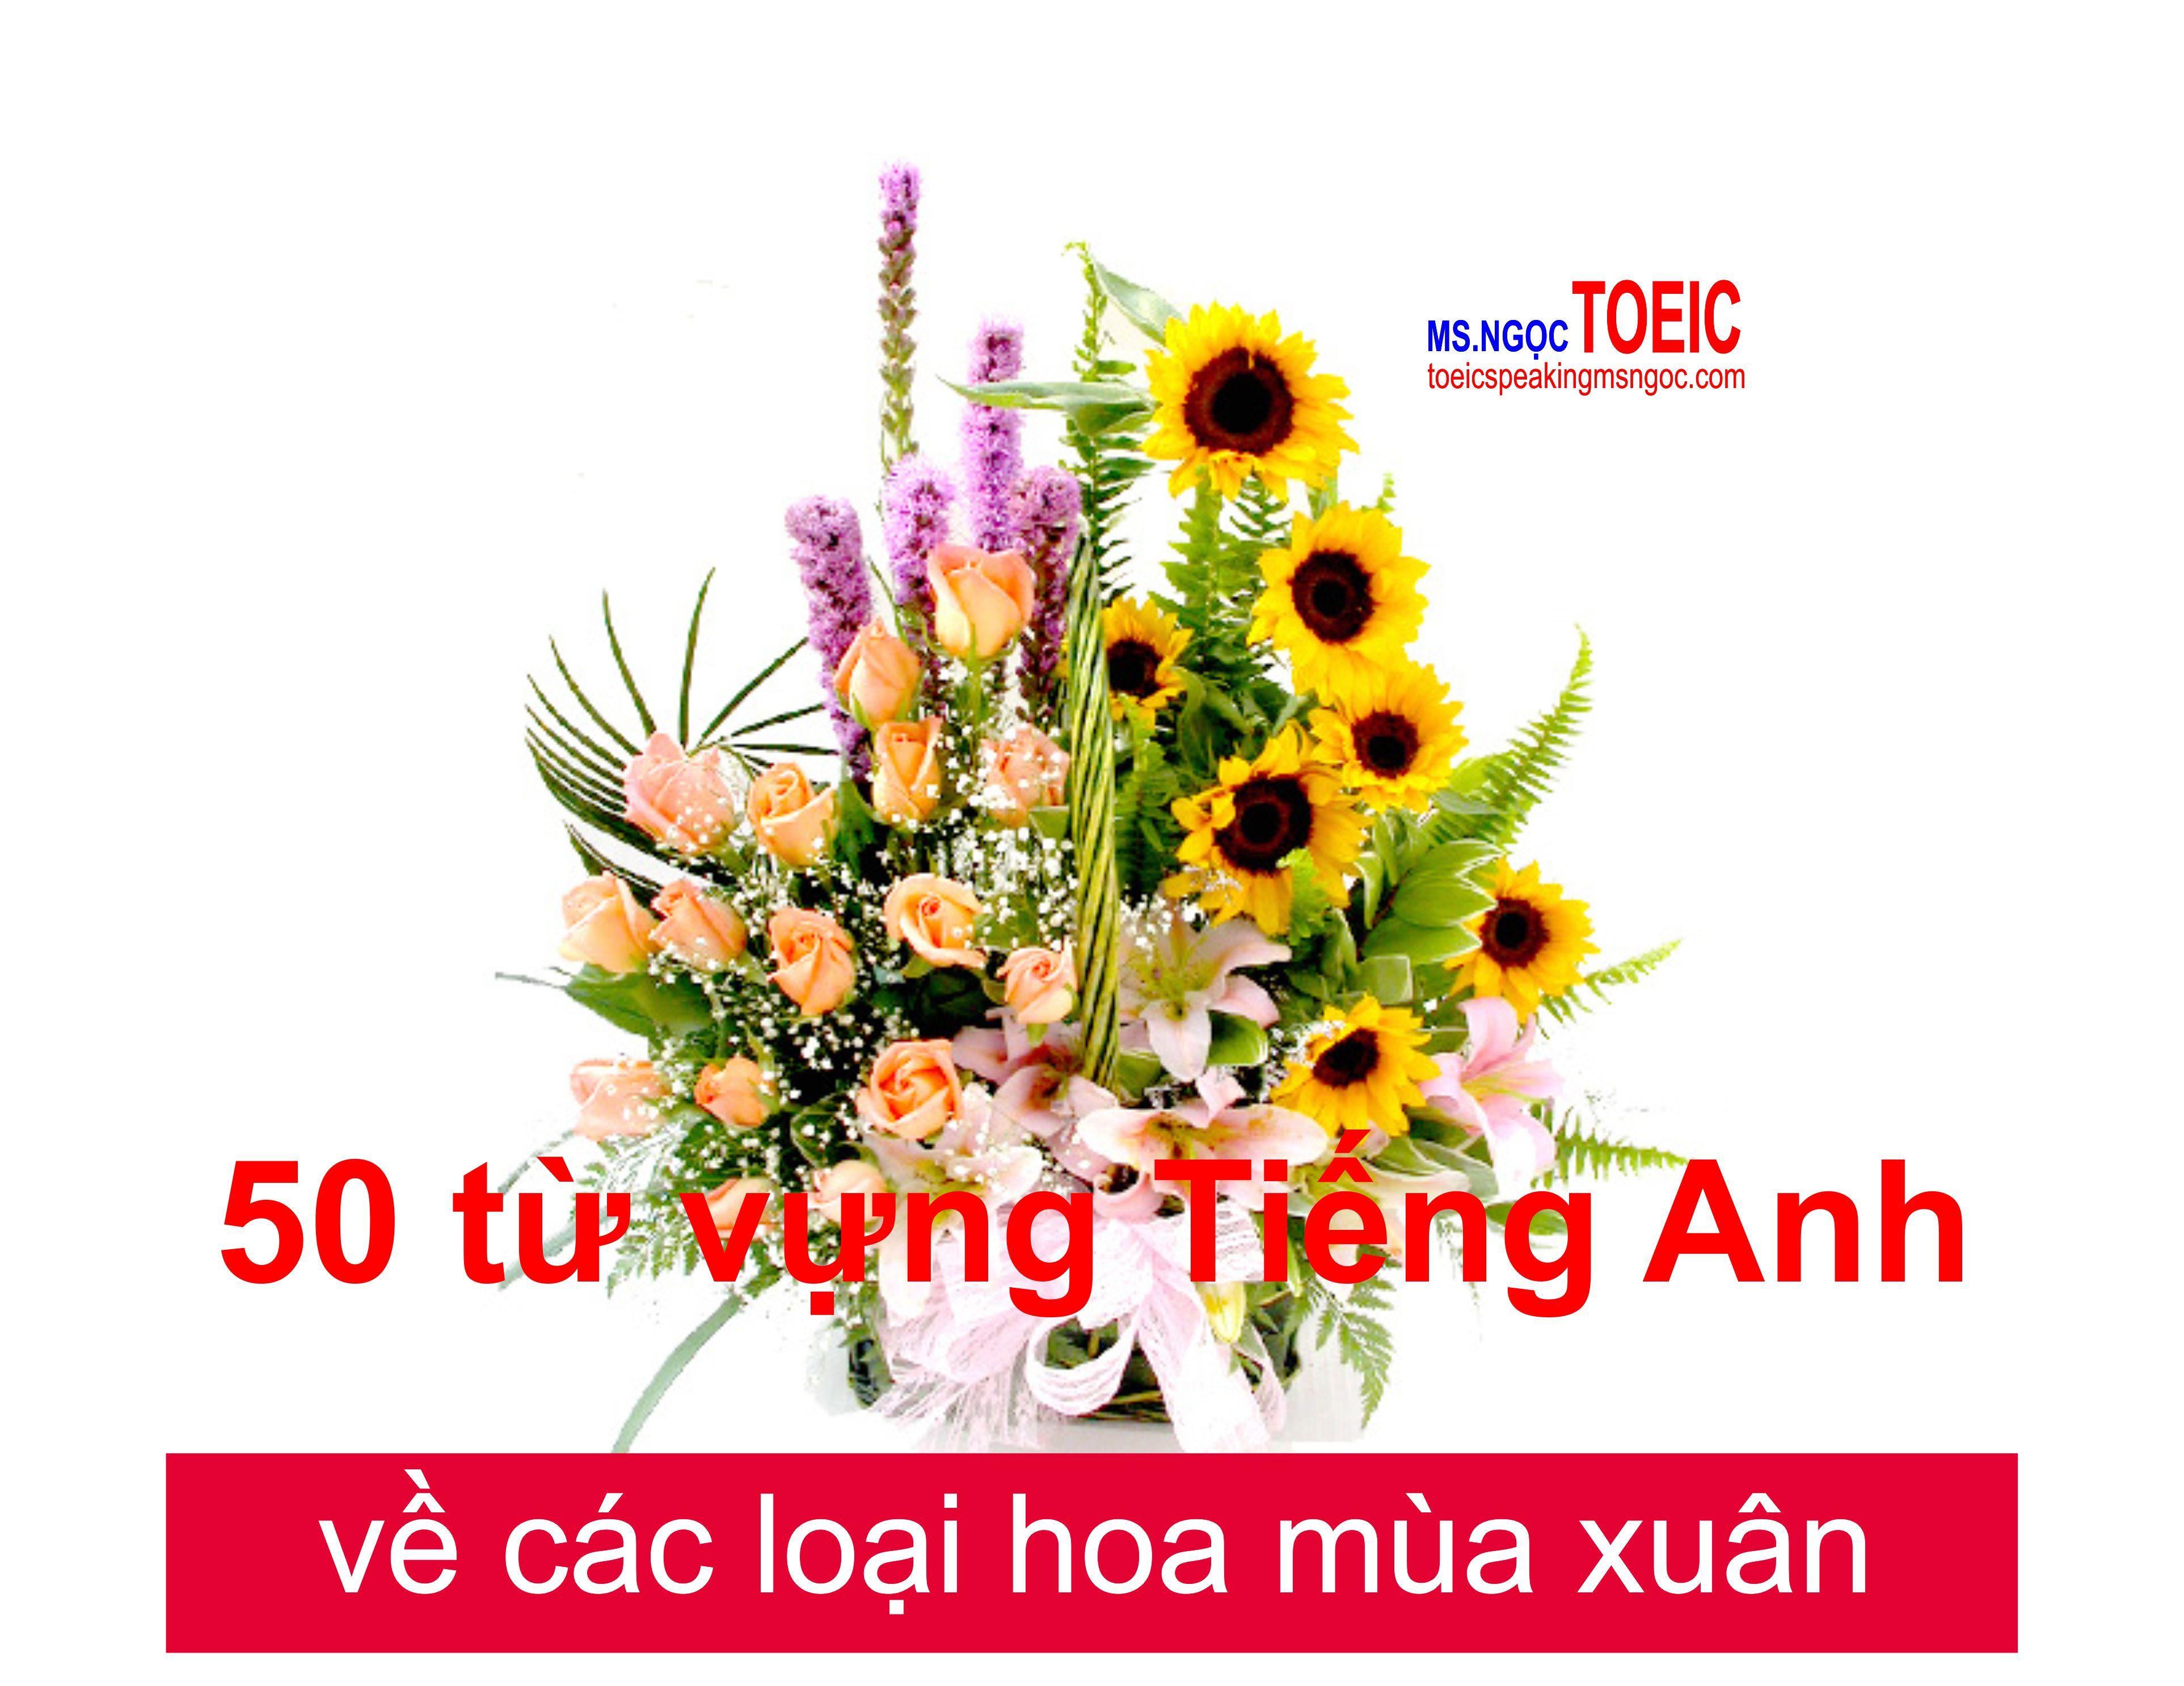 top-50-tu-vung-tieng-anh-ve-cac-loai-hoa-pho-bien-nhat-187